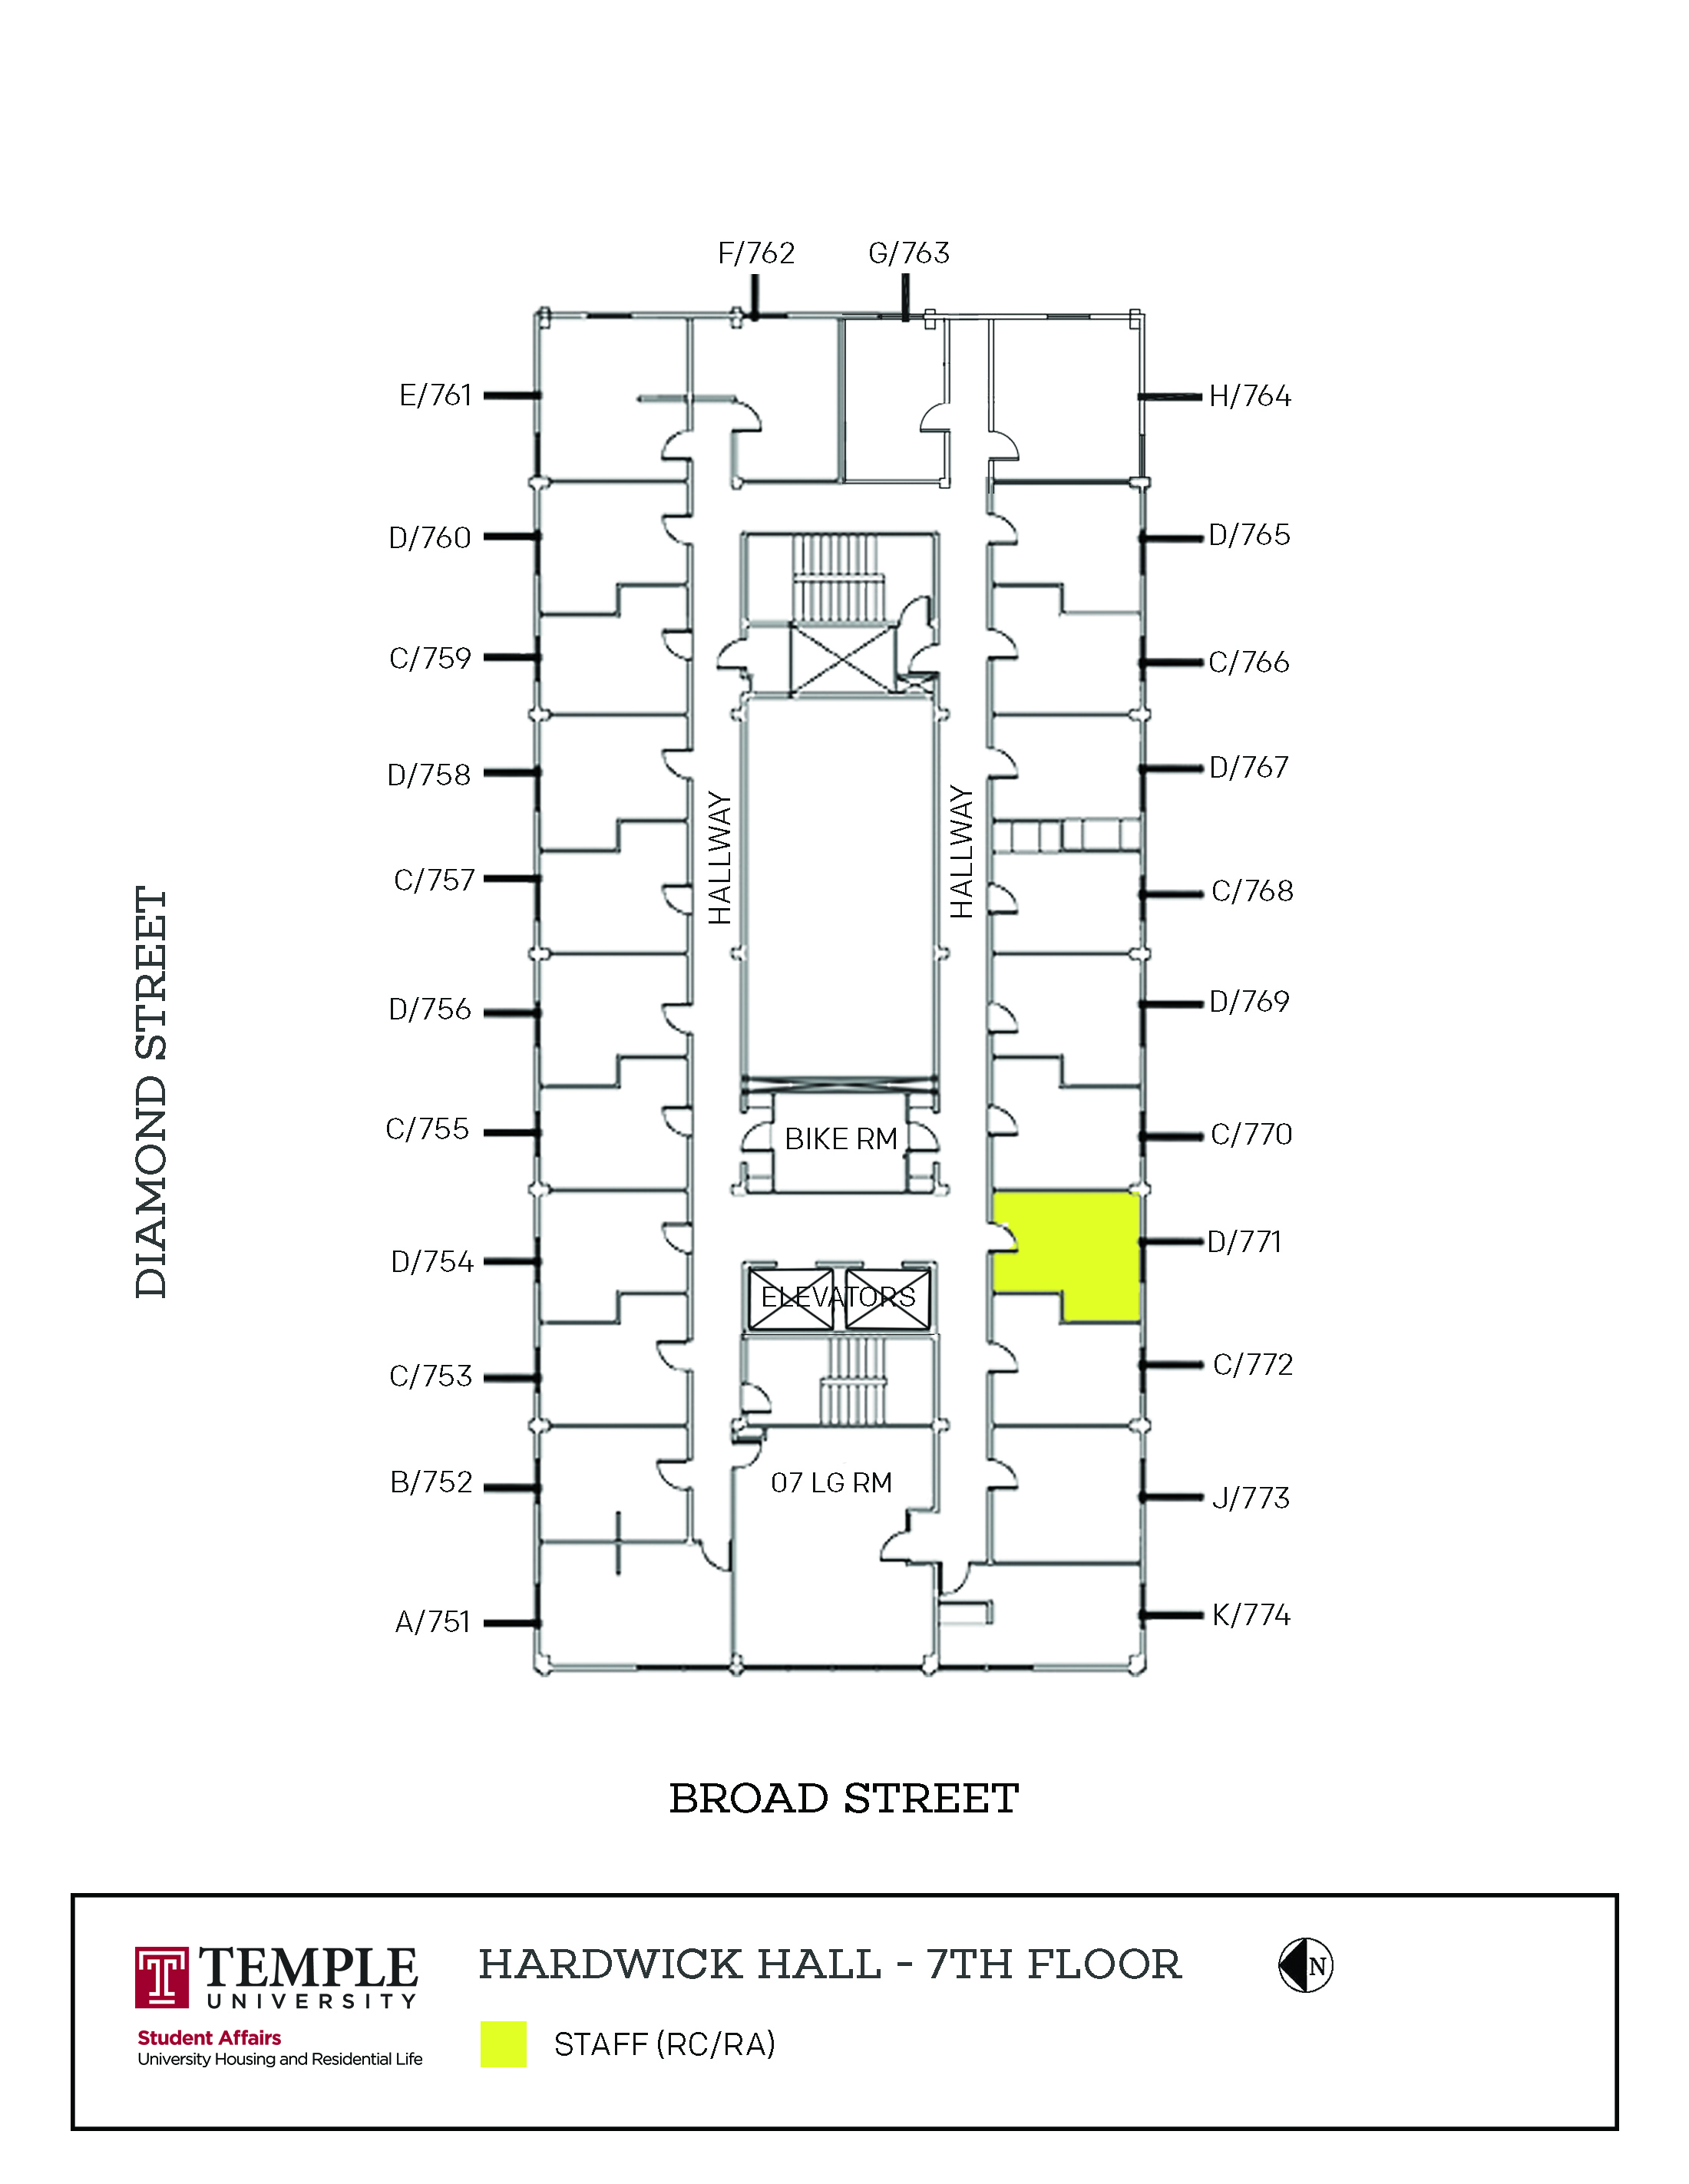 pioneer deh p4000ub wiring diagram 2005 ford f 150 front bumper hardwick hall floor plan - free download